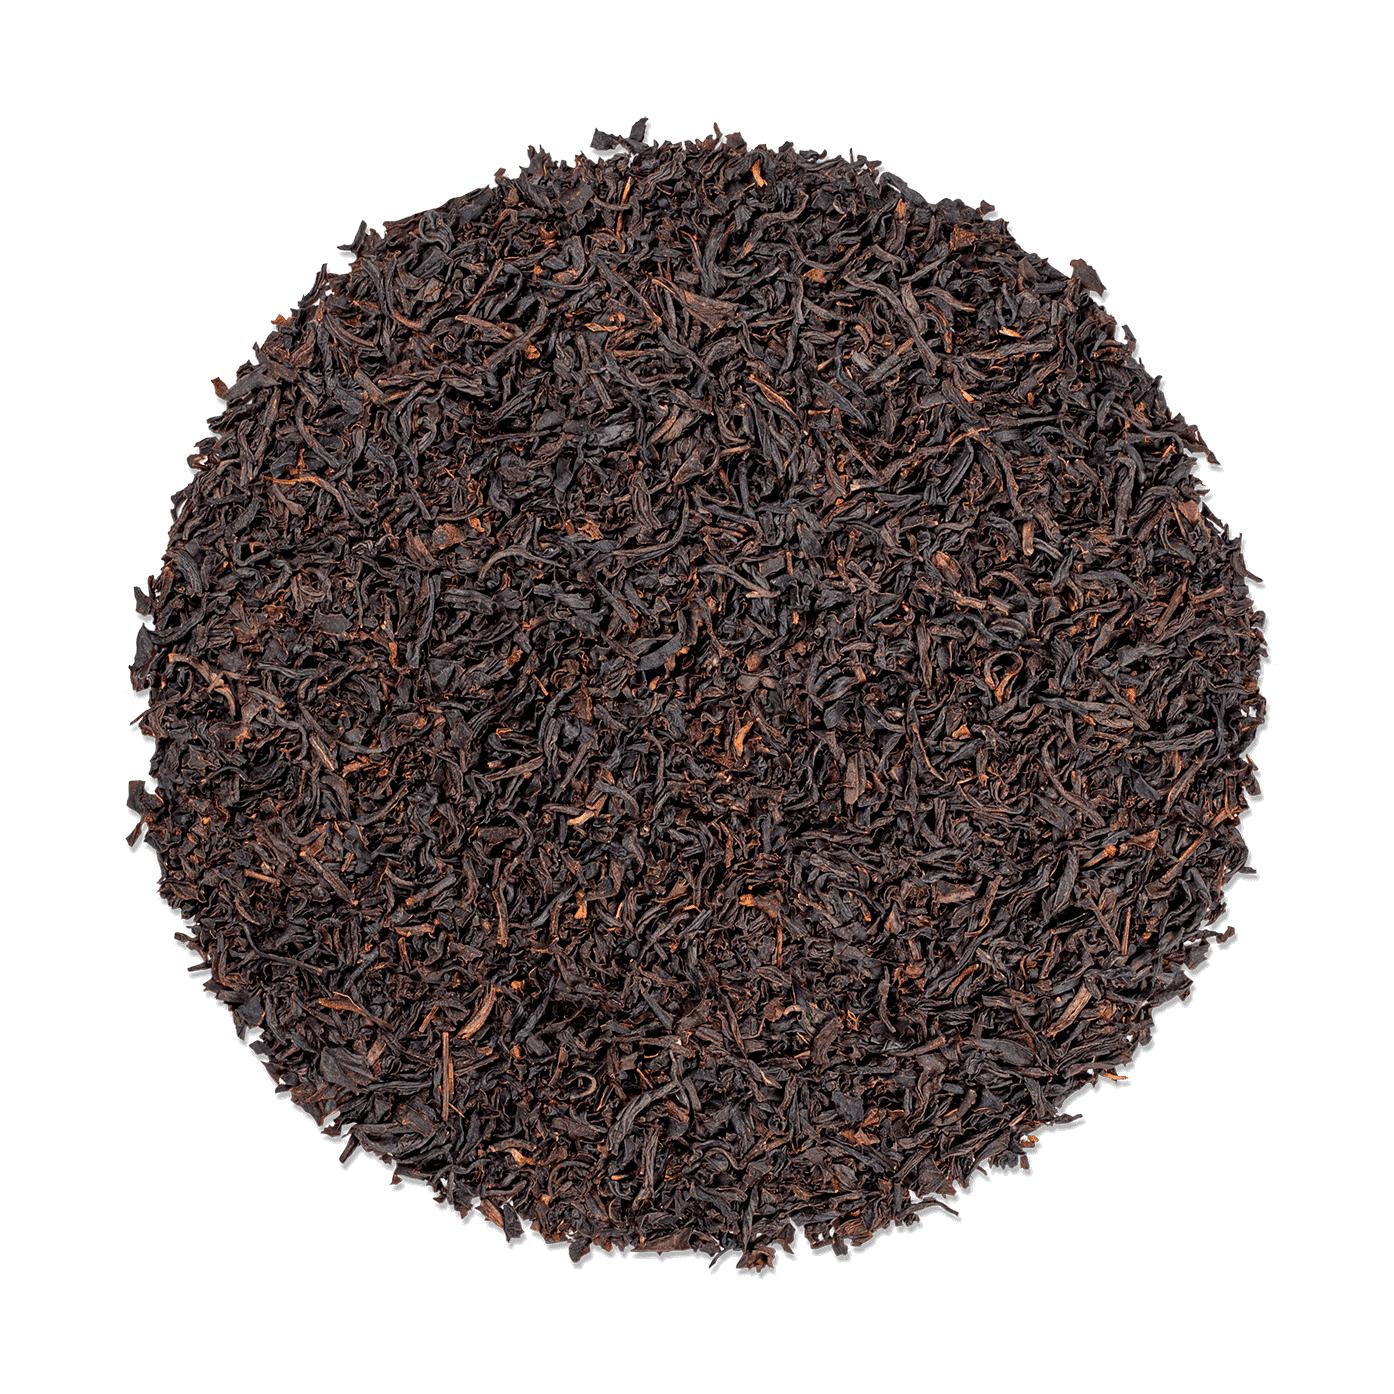 KUSMI TEA Troïka bio - Thé noir, earl grey aux agrumes - Kusmi Tea